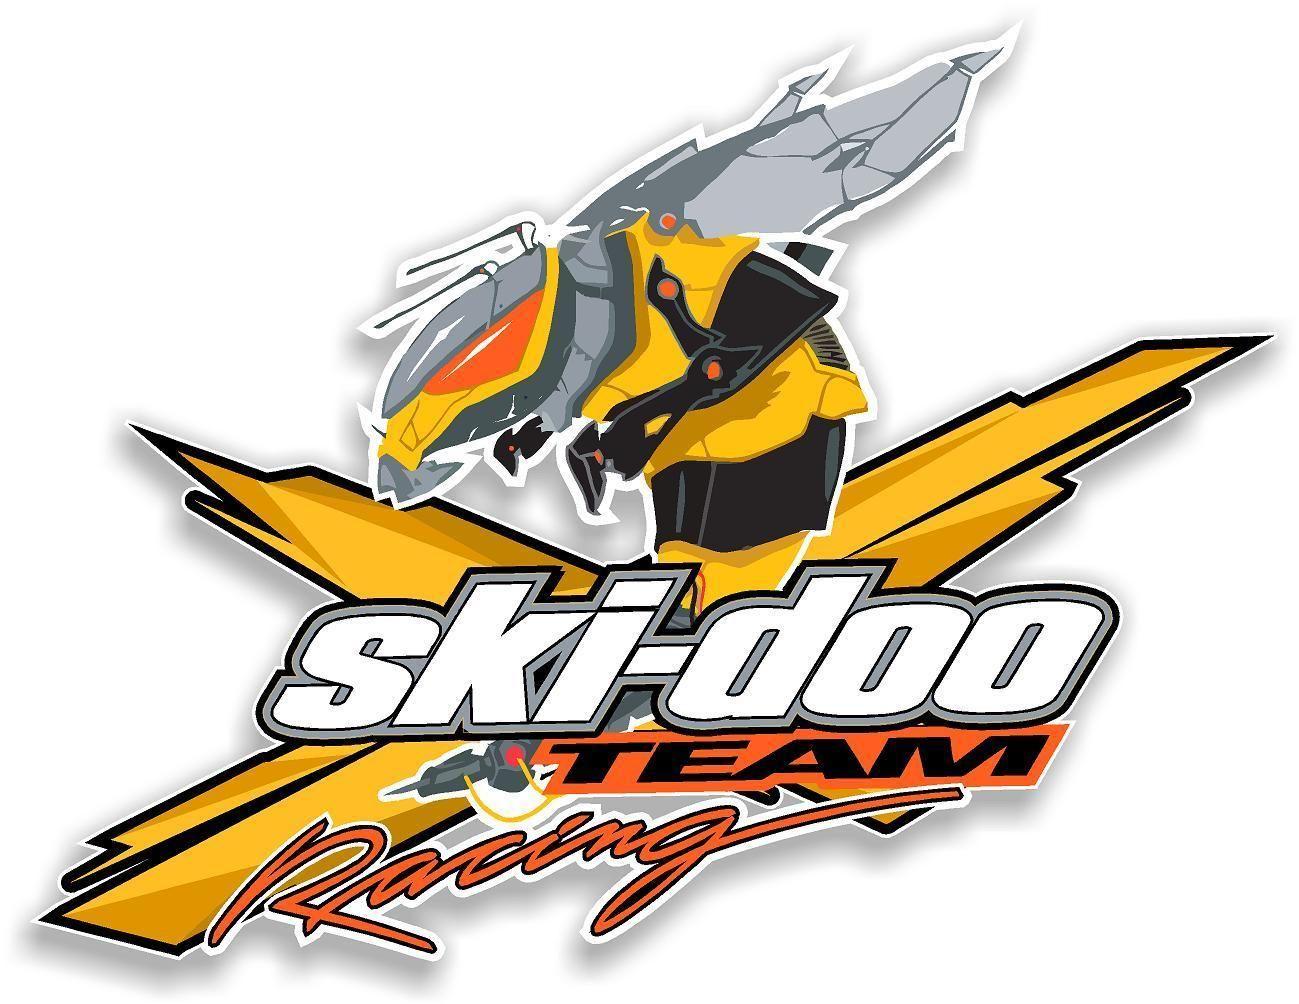 WHITE SKI-DOO Team-X Logo 4 Pack Vinyl Vehicle Window Sticker Graphics Decal